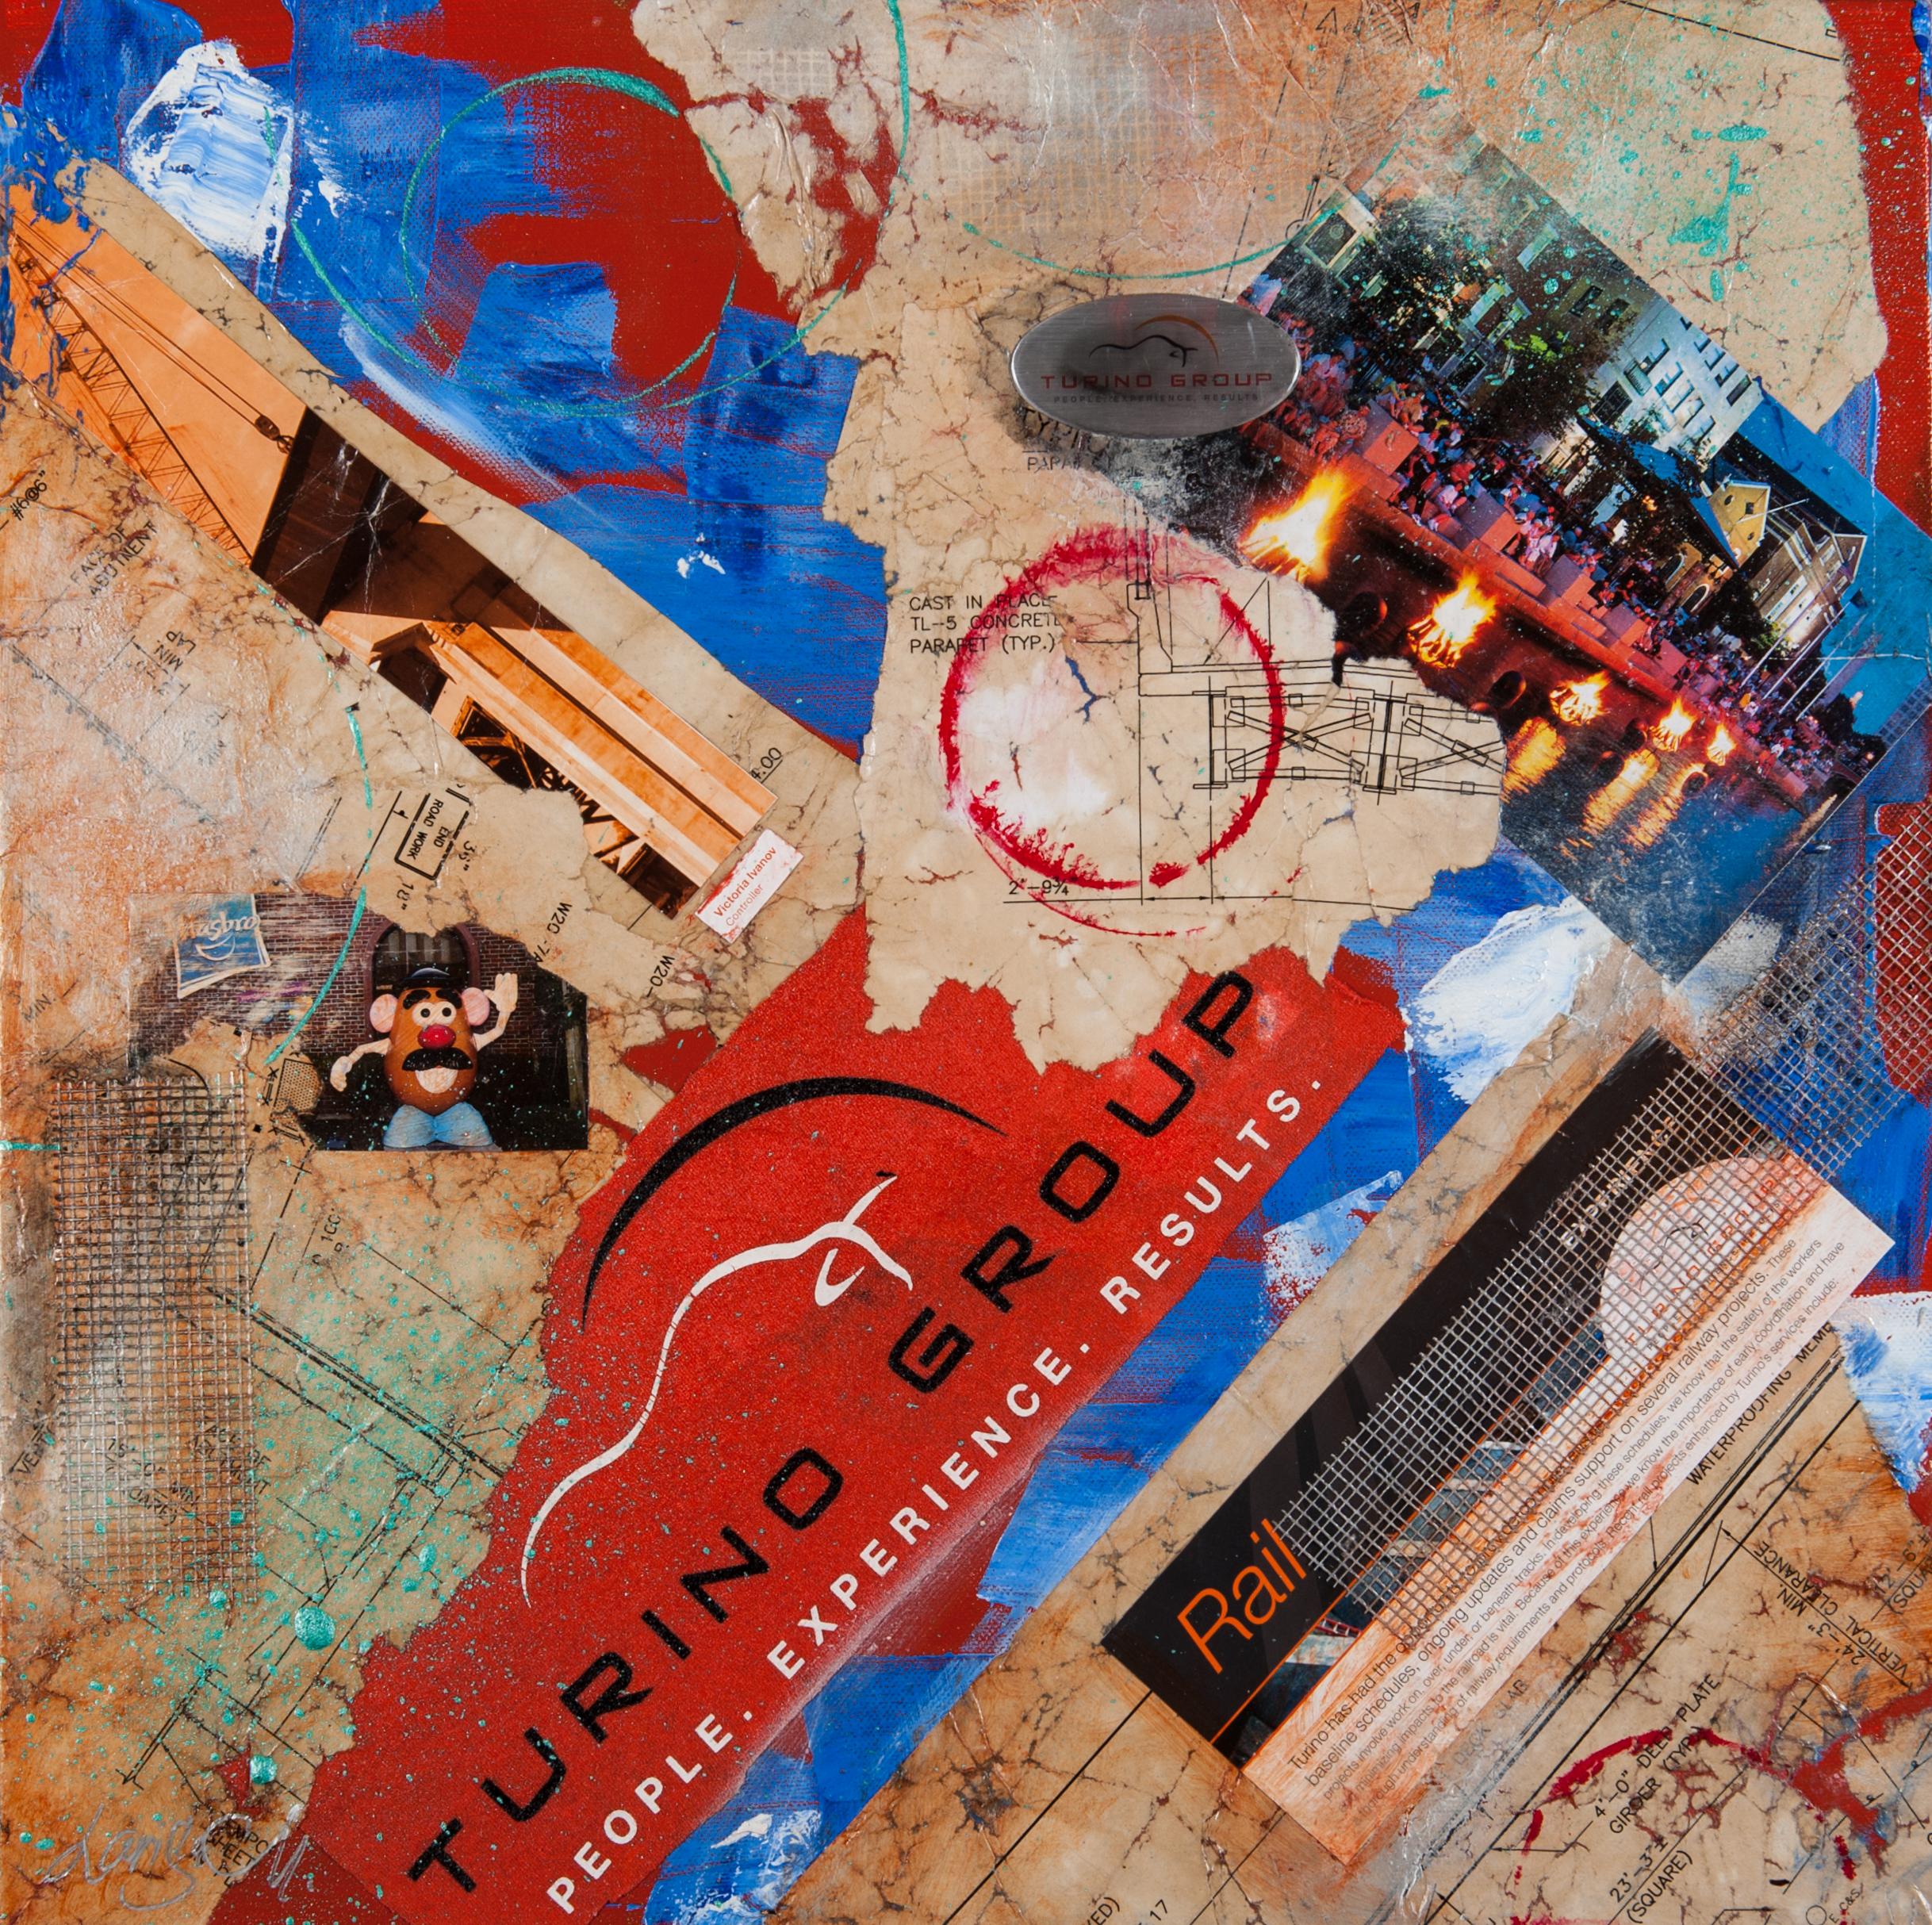 Tudino Engineering Firm, RI - 18X18 Custom Collage